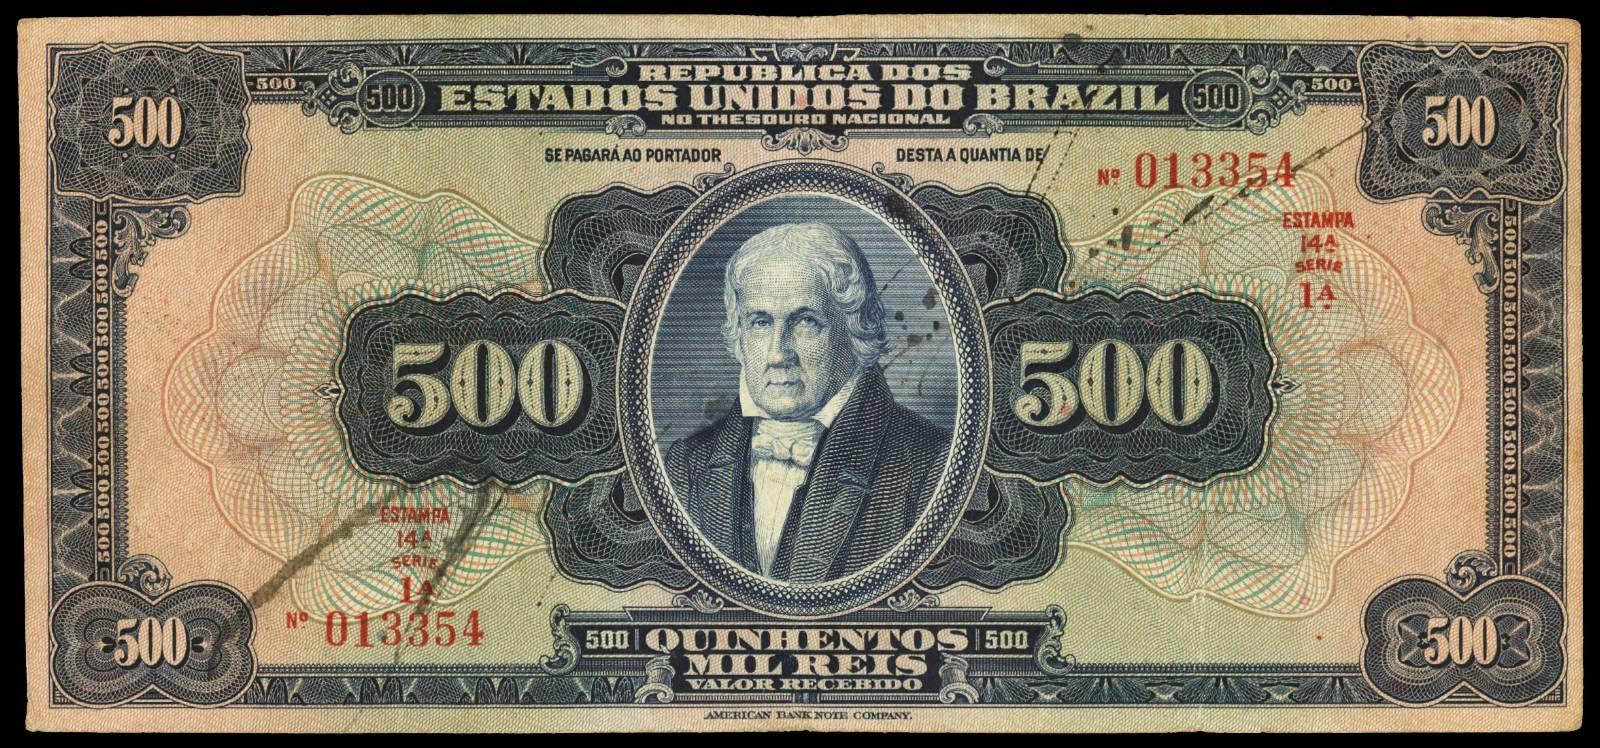 Brazil Banknotes 500 Mil Reis bank note 1925 Jose Bonifacio de Andrada e Silva